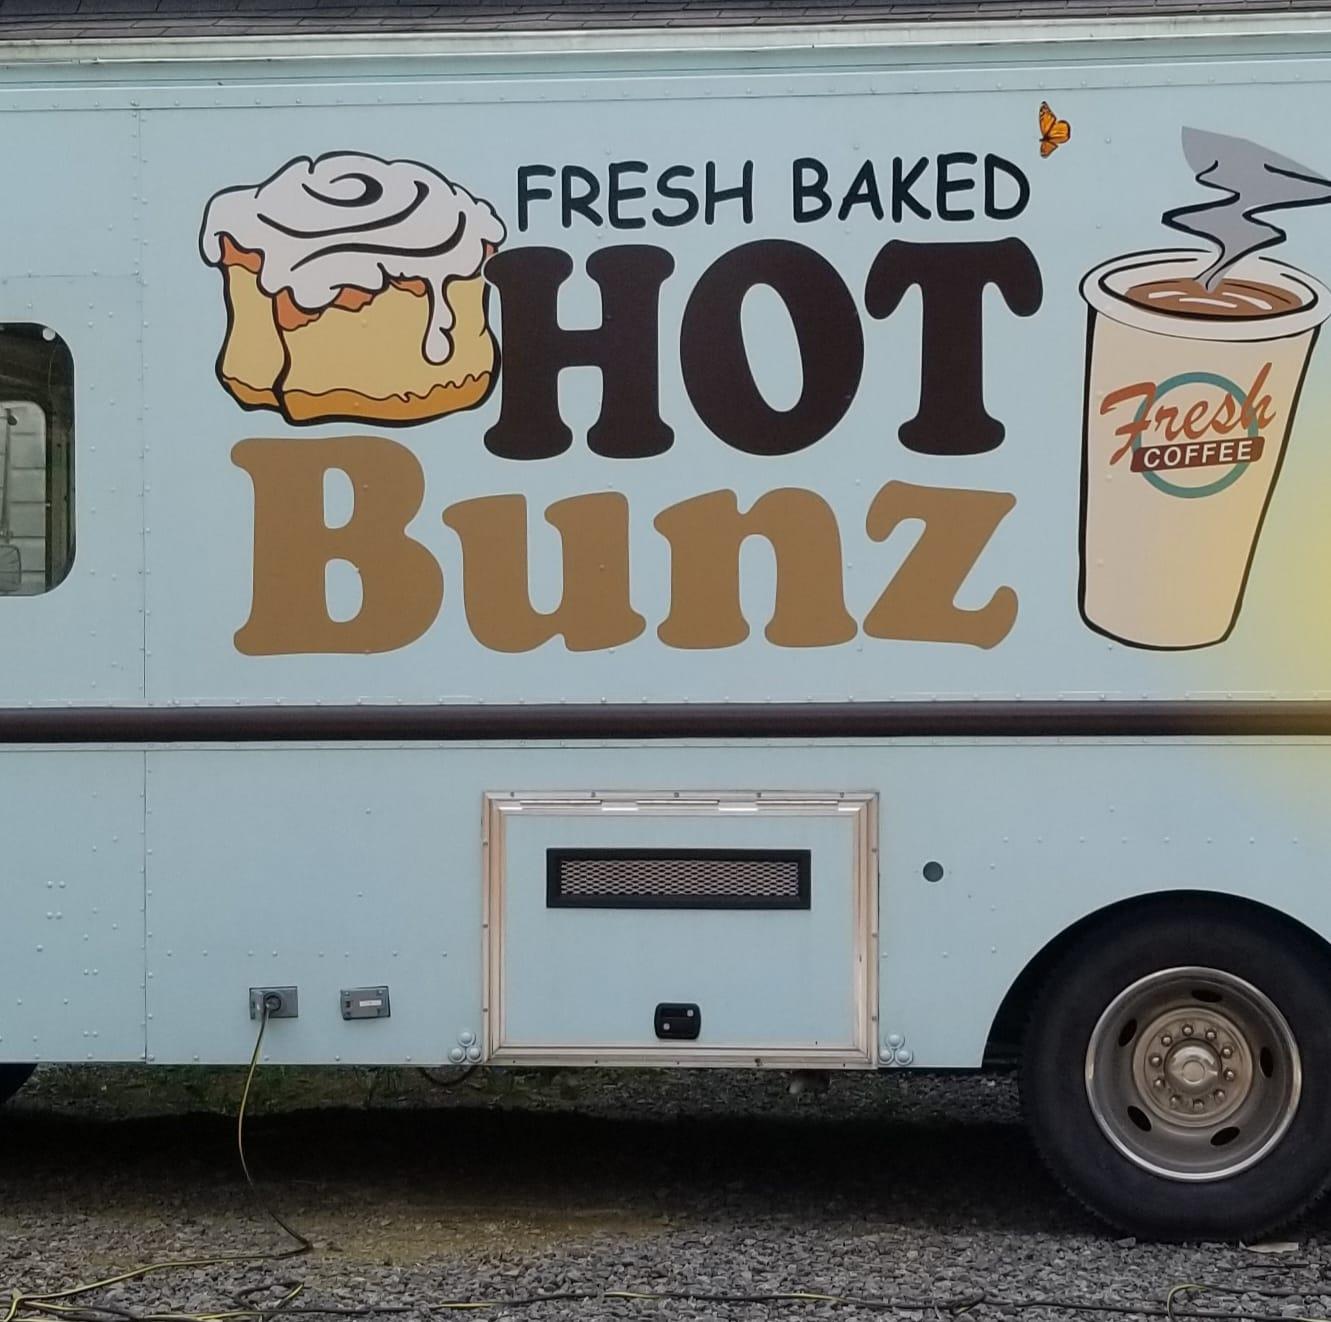 Hot Bunz food truck profile image